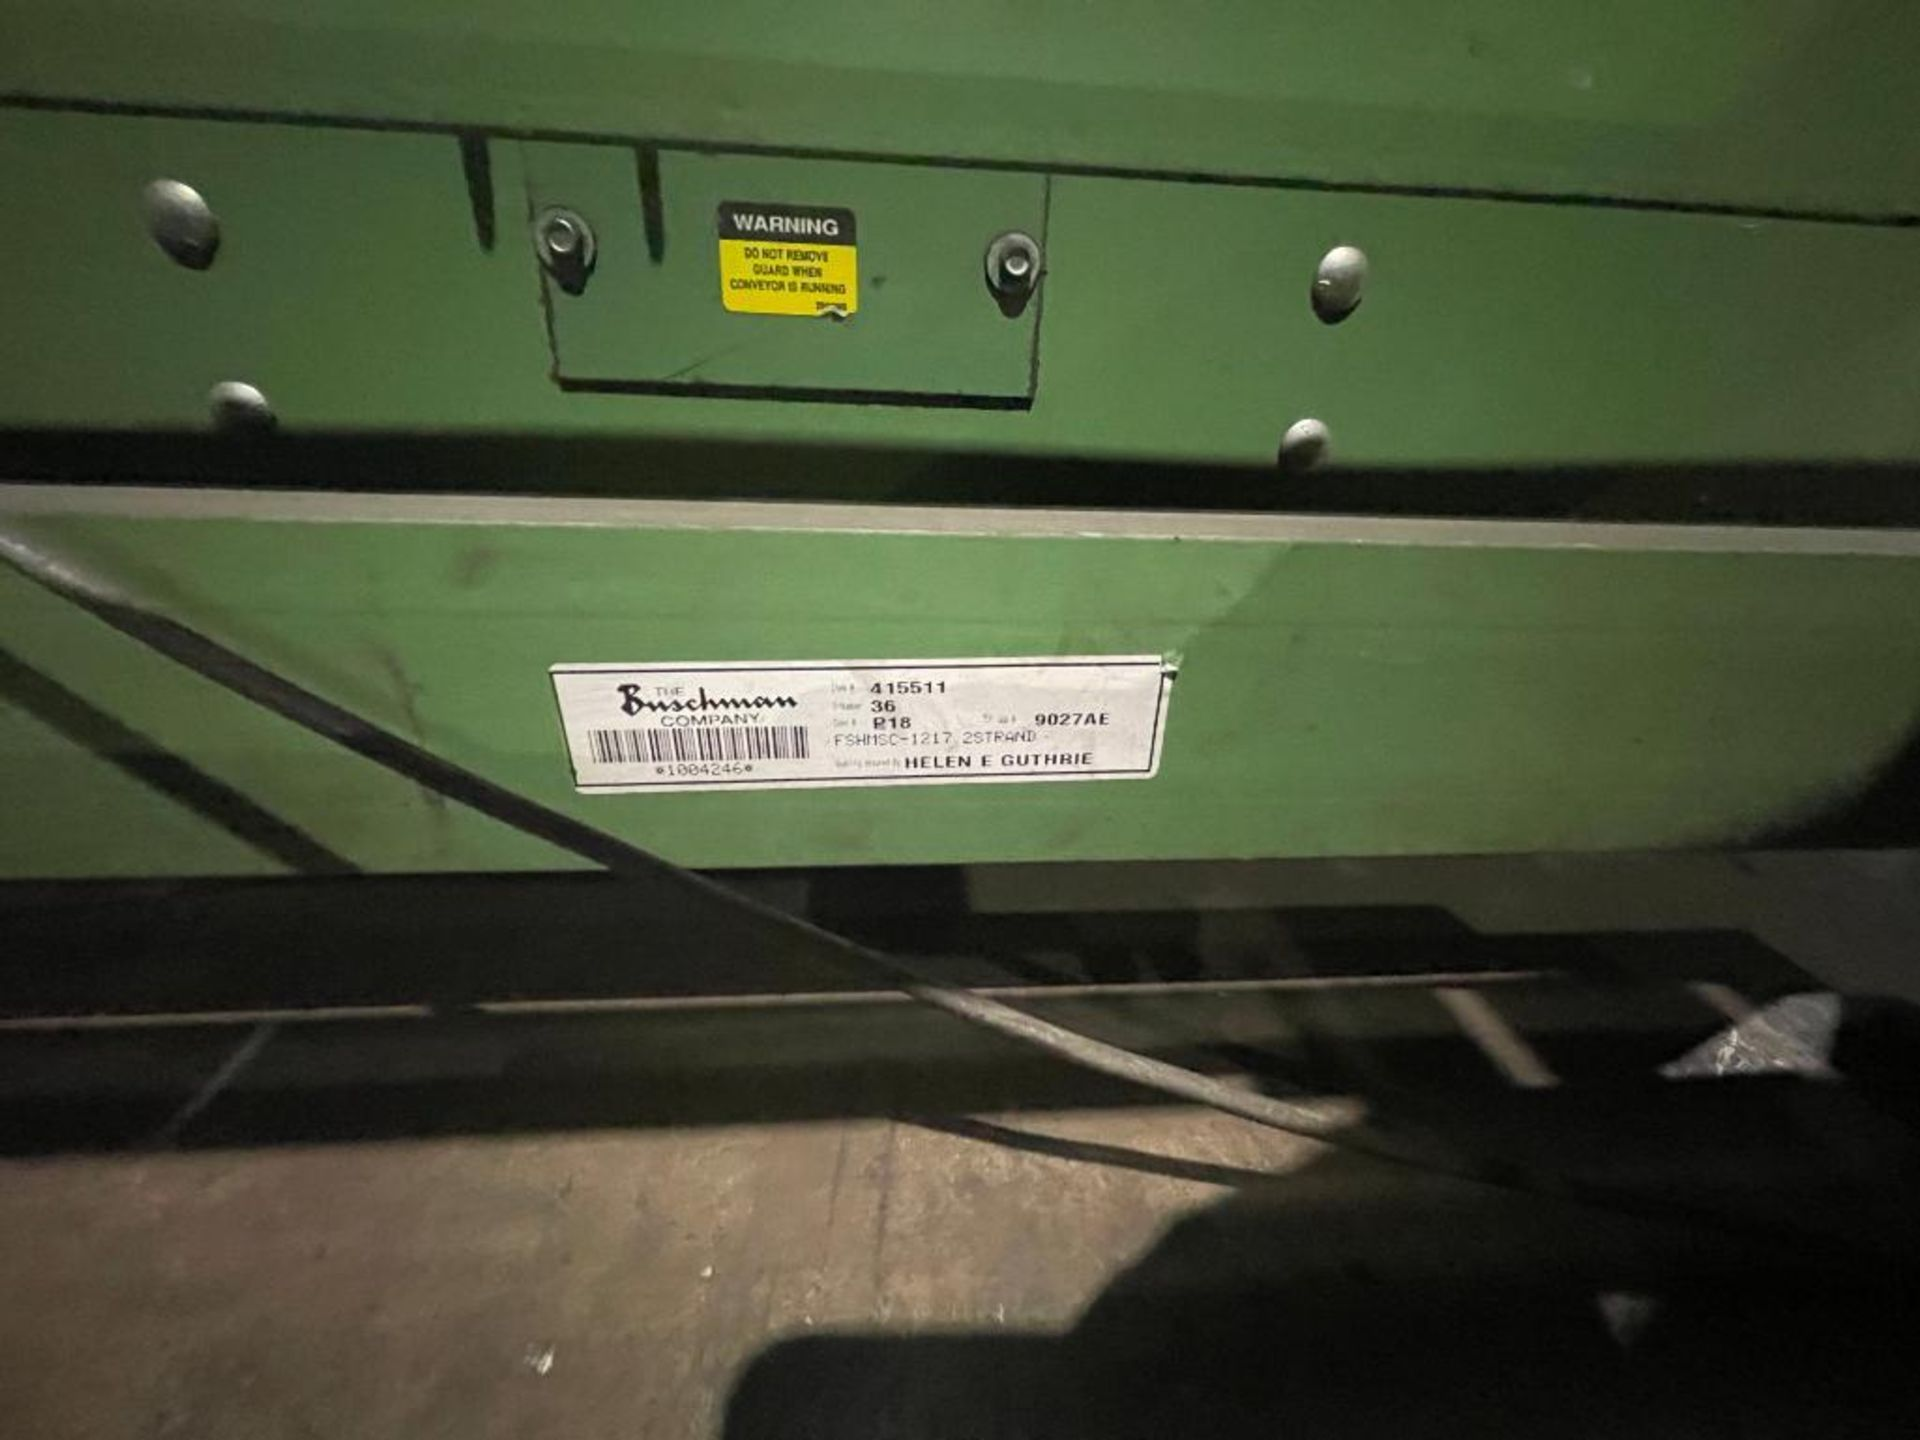 Buschman full pallet conveyor - Image 4 of 12